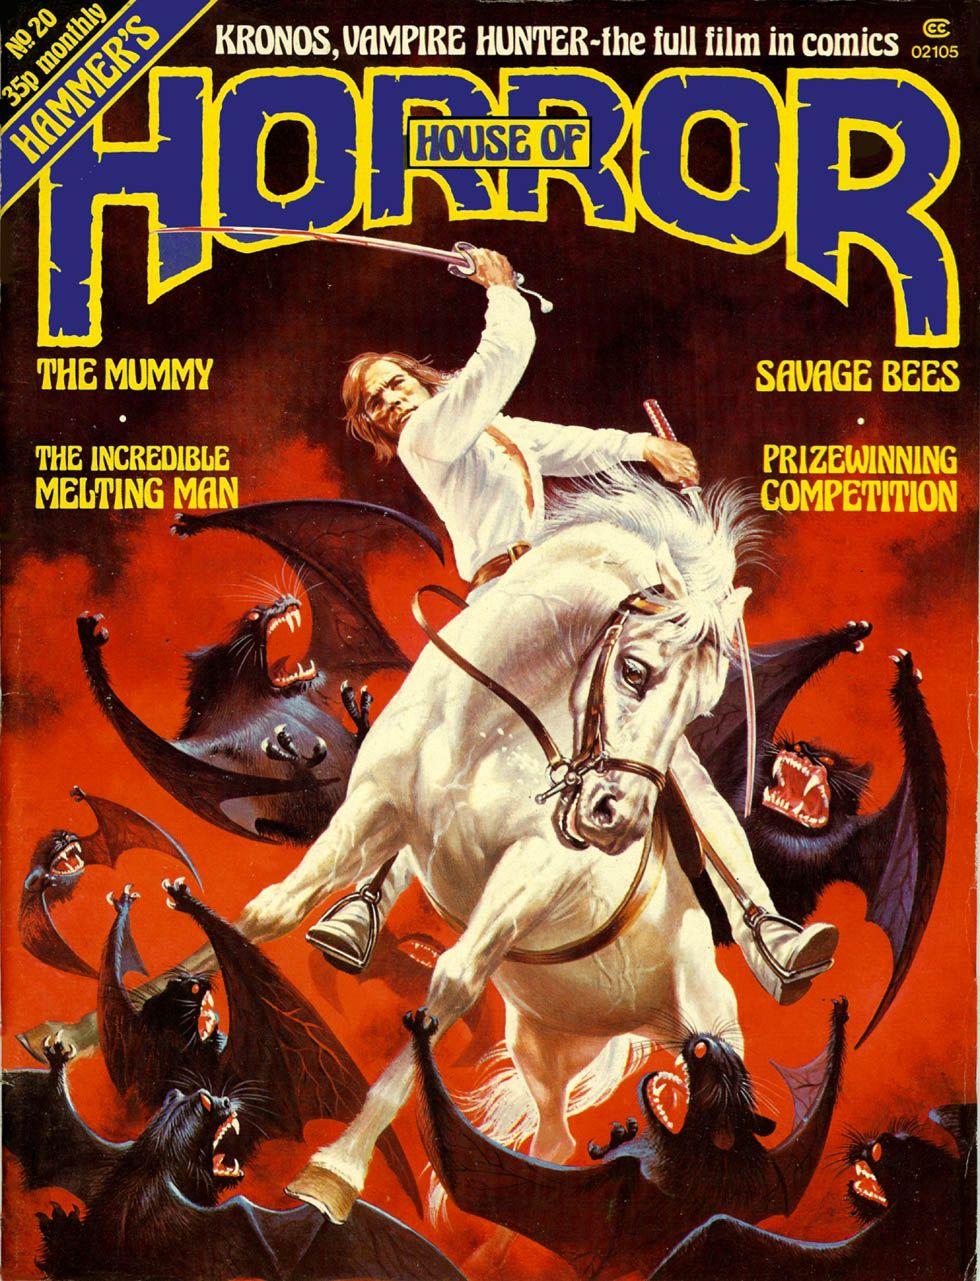 Hammer House of Horror cover featuring Captain Kronos: Vampire Hunter